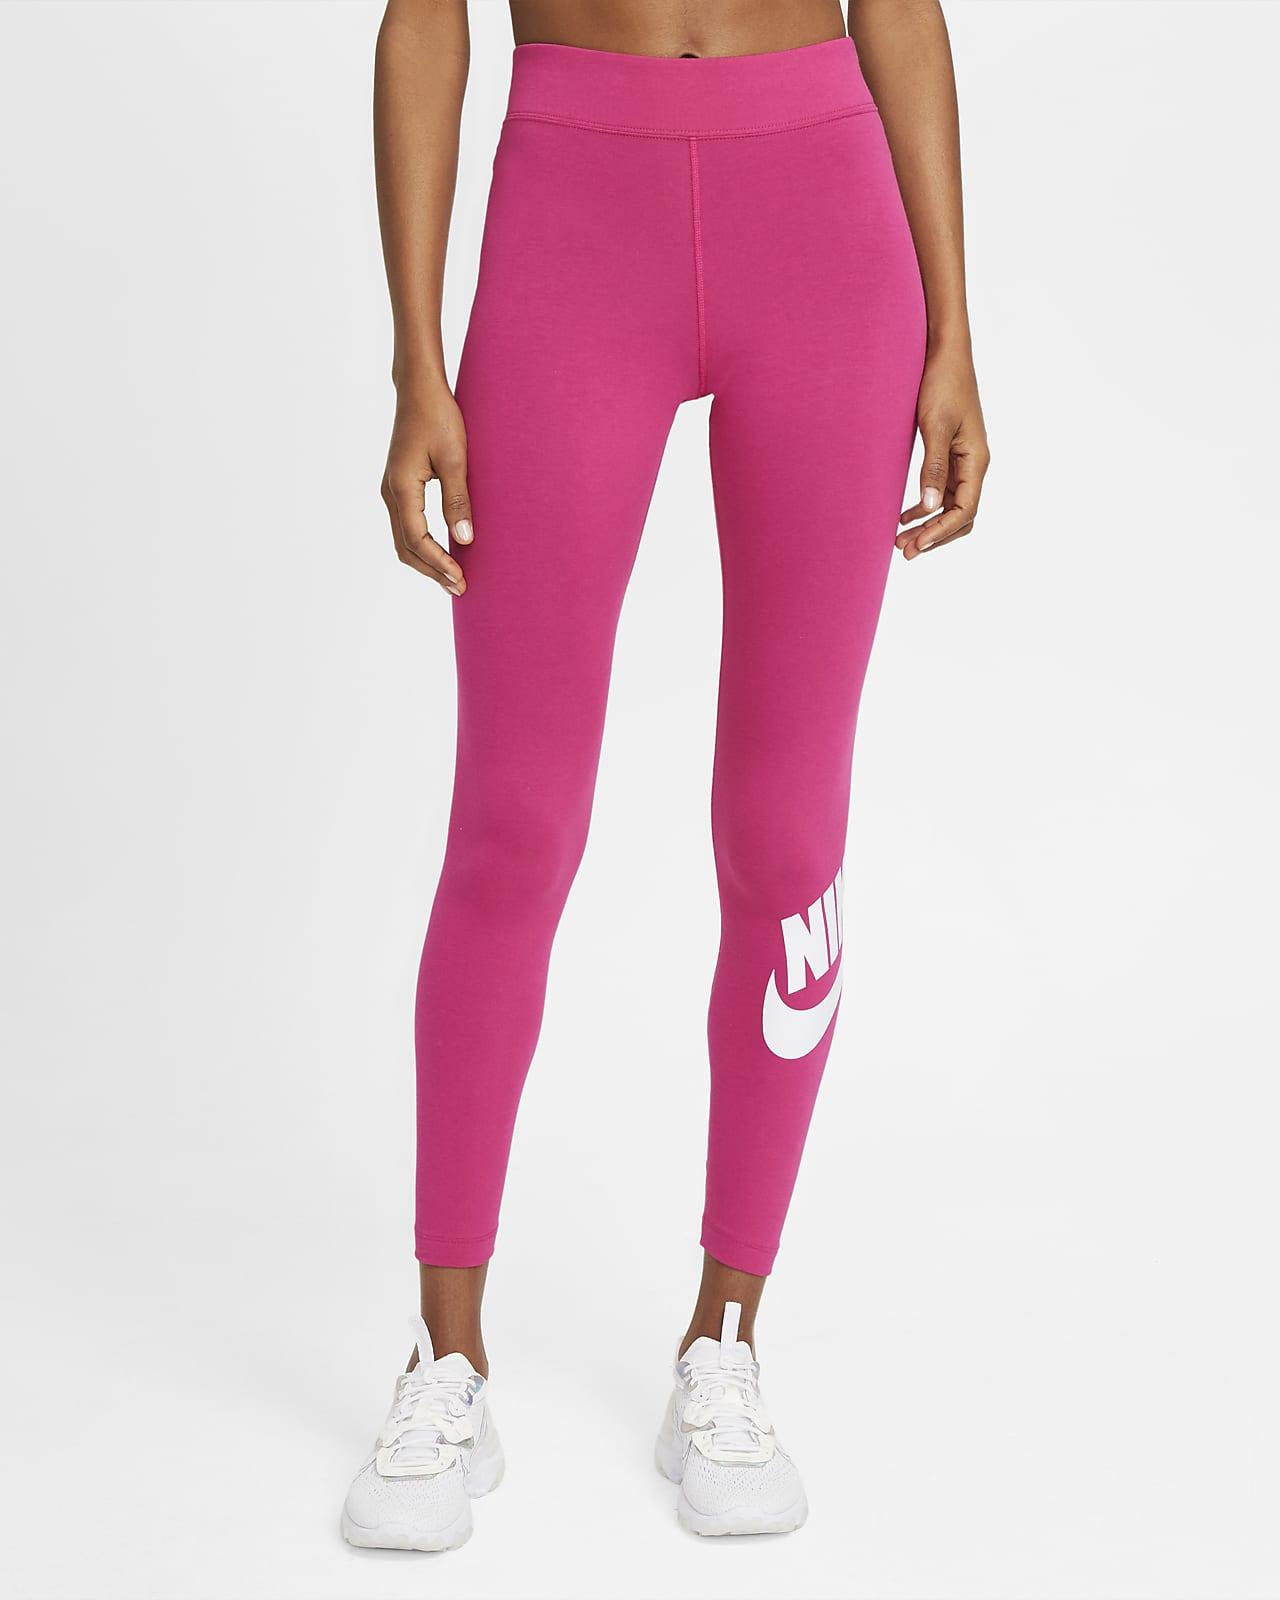 Nike Sportswear Essential Damen-Leggings mit hohem Bund